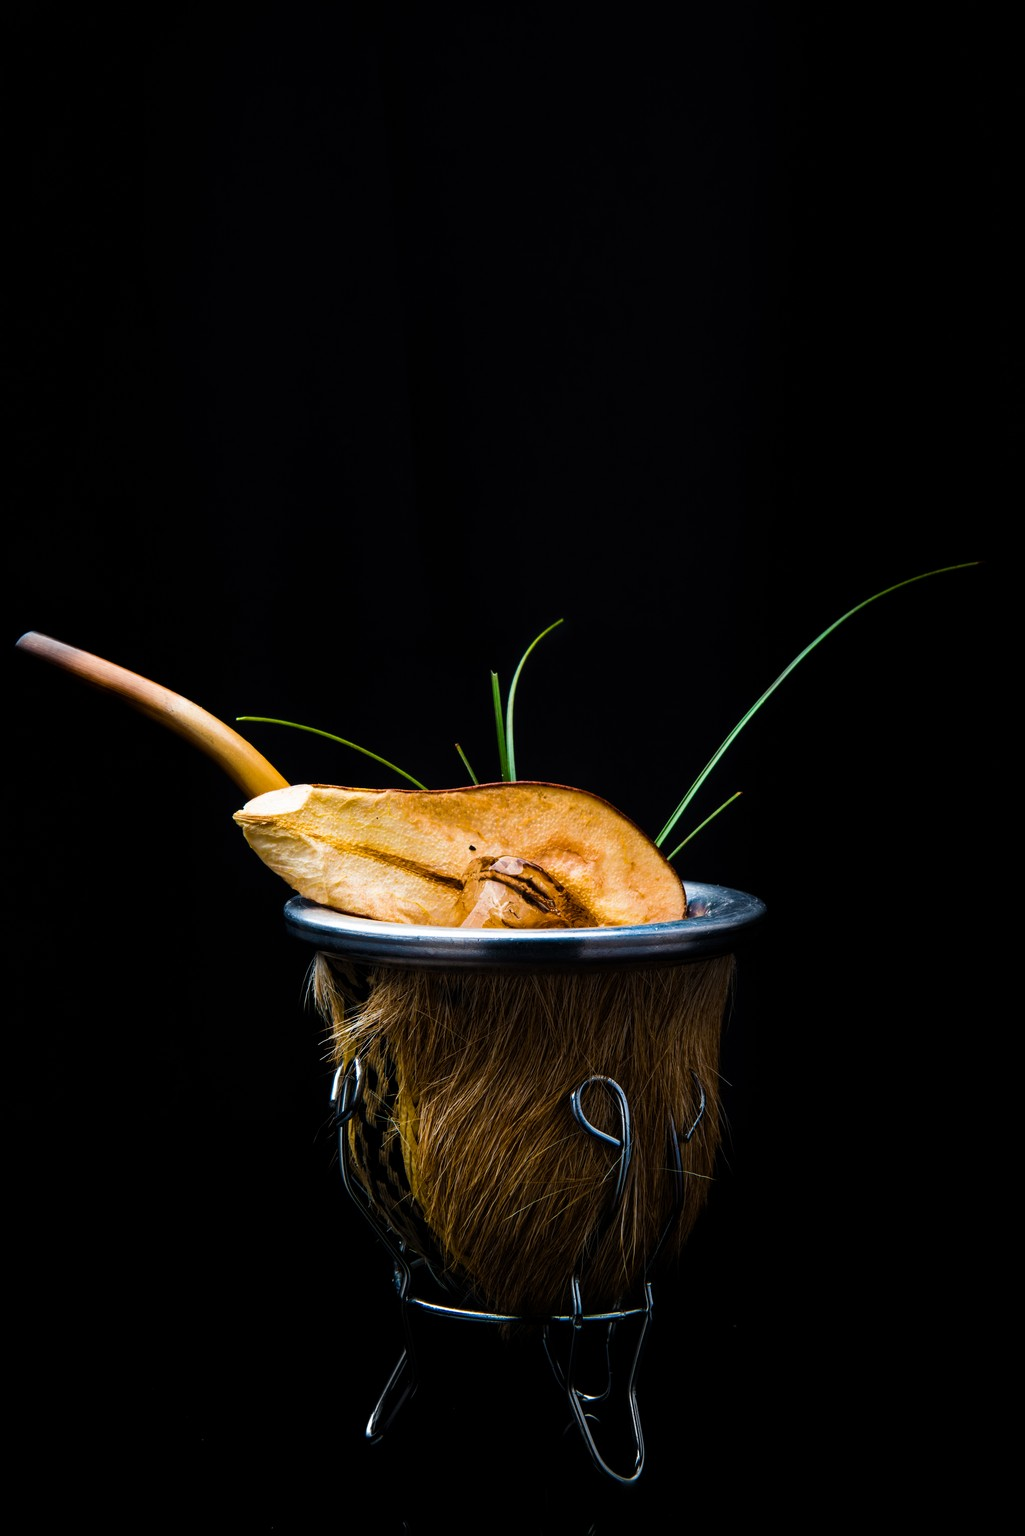 Flavia_Fiengo_Food_E_Beverage_00045